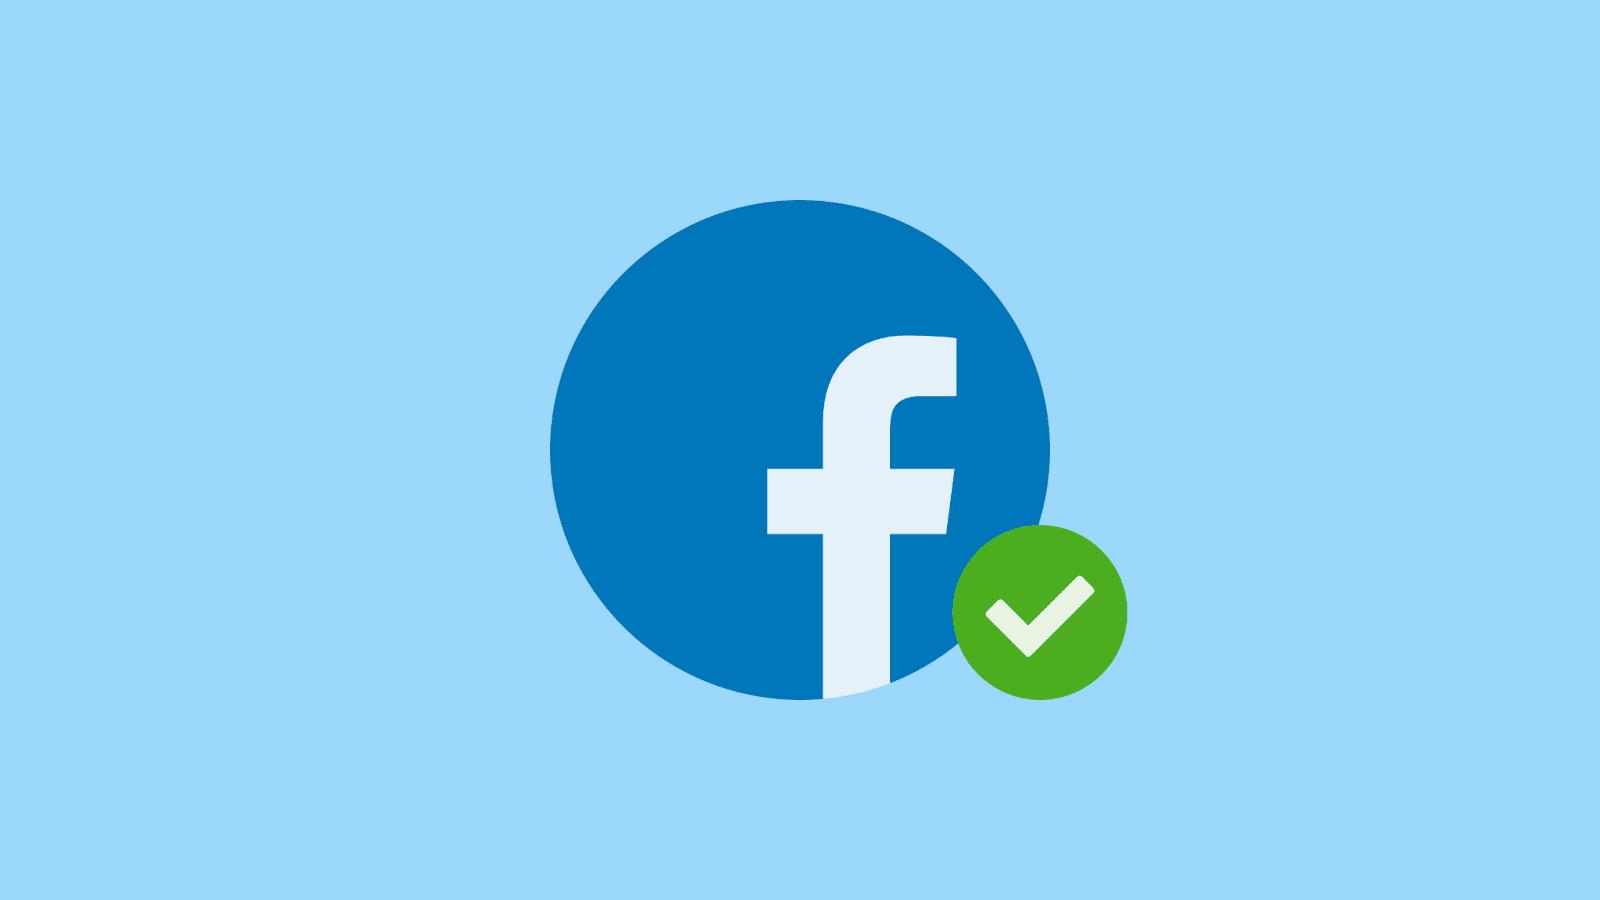 cach-xem-ai-vao-facebook-cua-minh-3